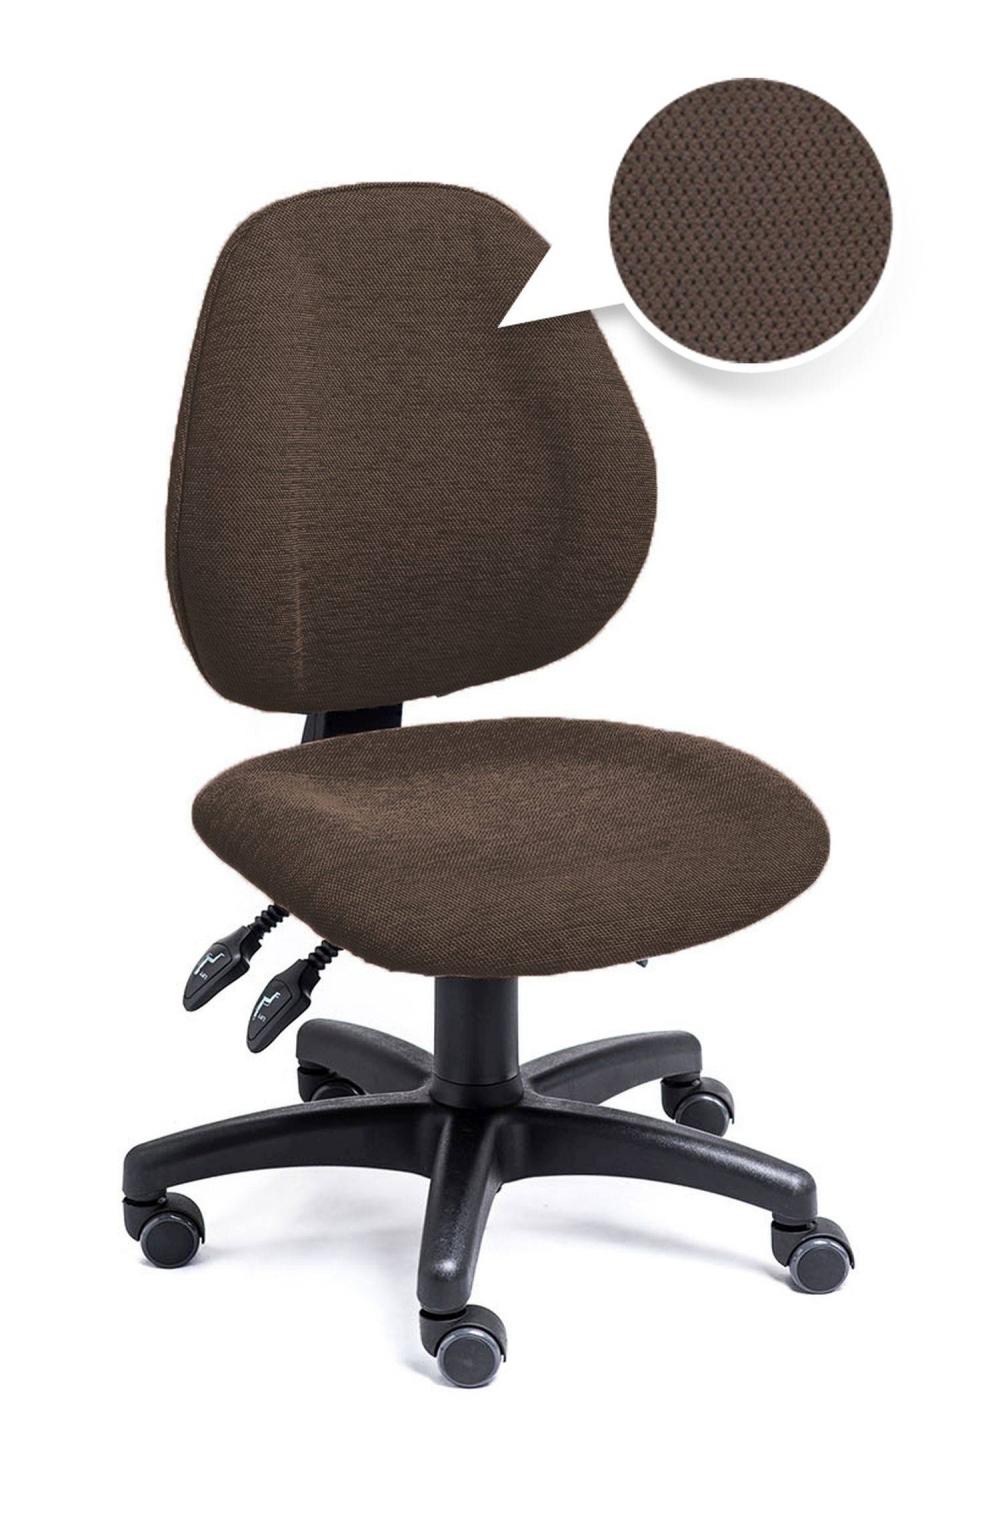 Detská rastúca stolička NO LIMIT FREE │ GORDON 25 čokoládová